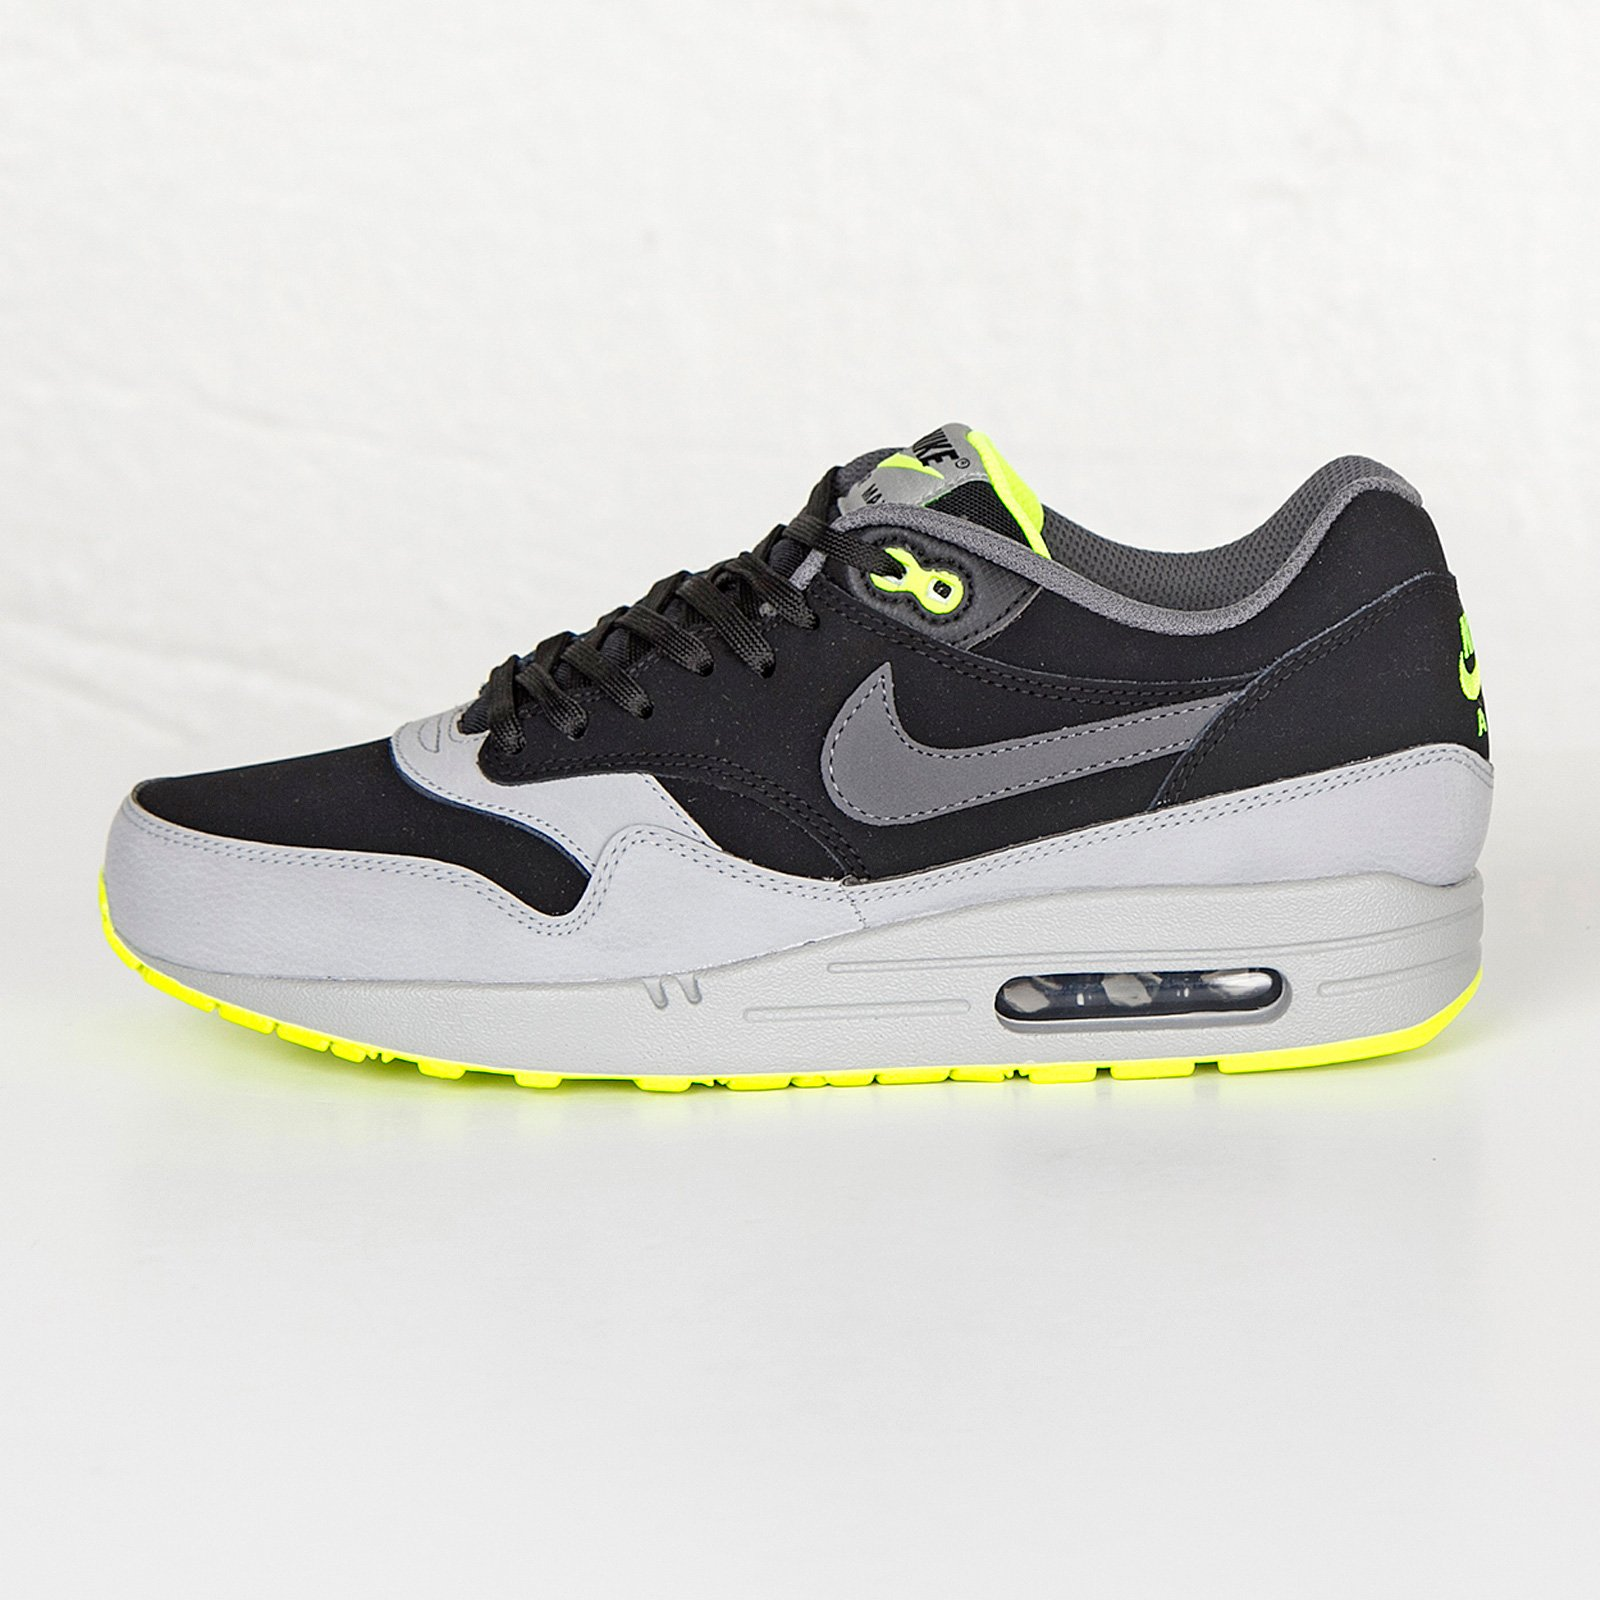 timeless design 79c32 66e97 Nike Air Max 1 LTR - 654466-007 - Sneakersnstuff   sneakers   streetwear  online since 1999